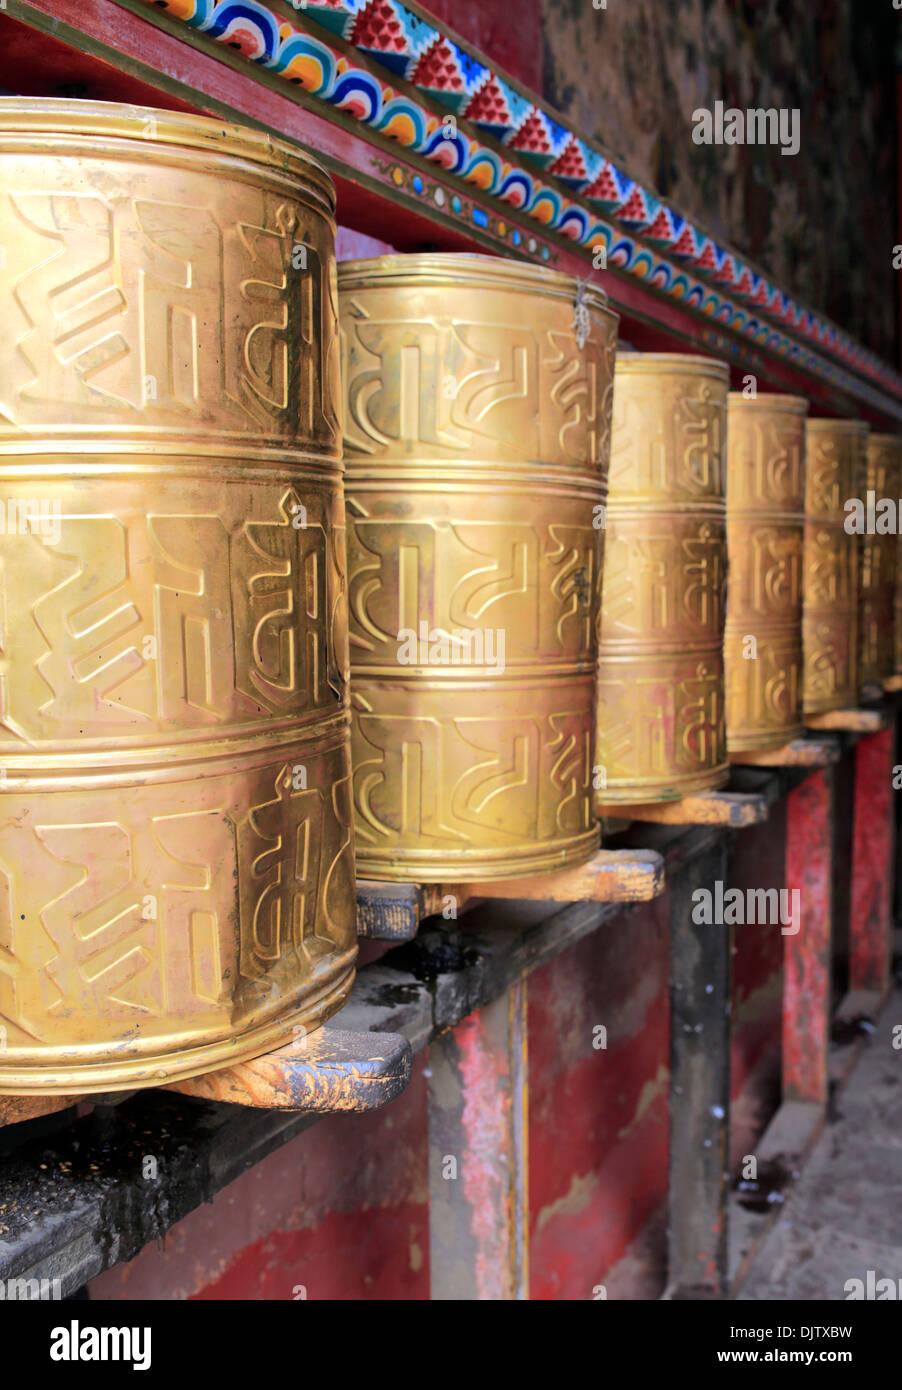 Prayer wheels, Sakya Monastery, Shigatse Prefecture, Tibet, China - Stock Image